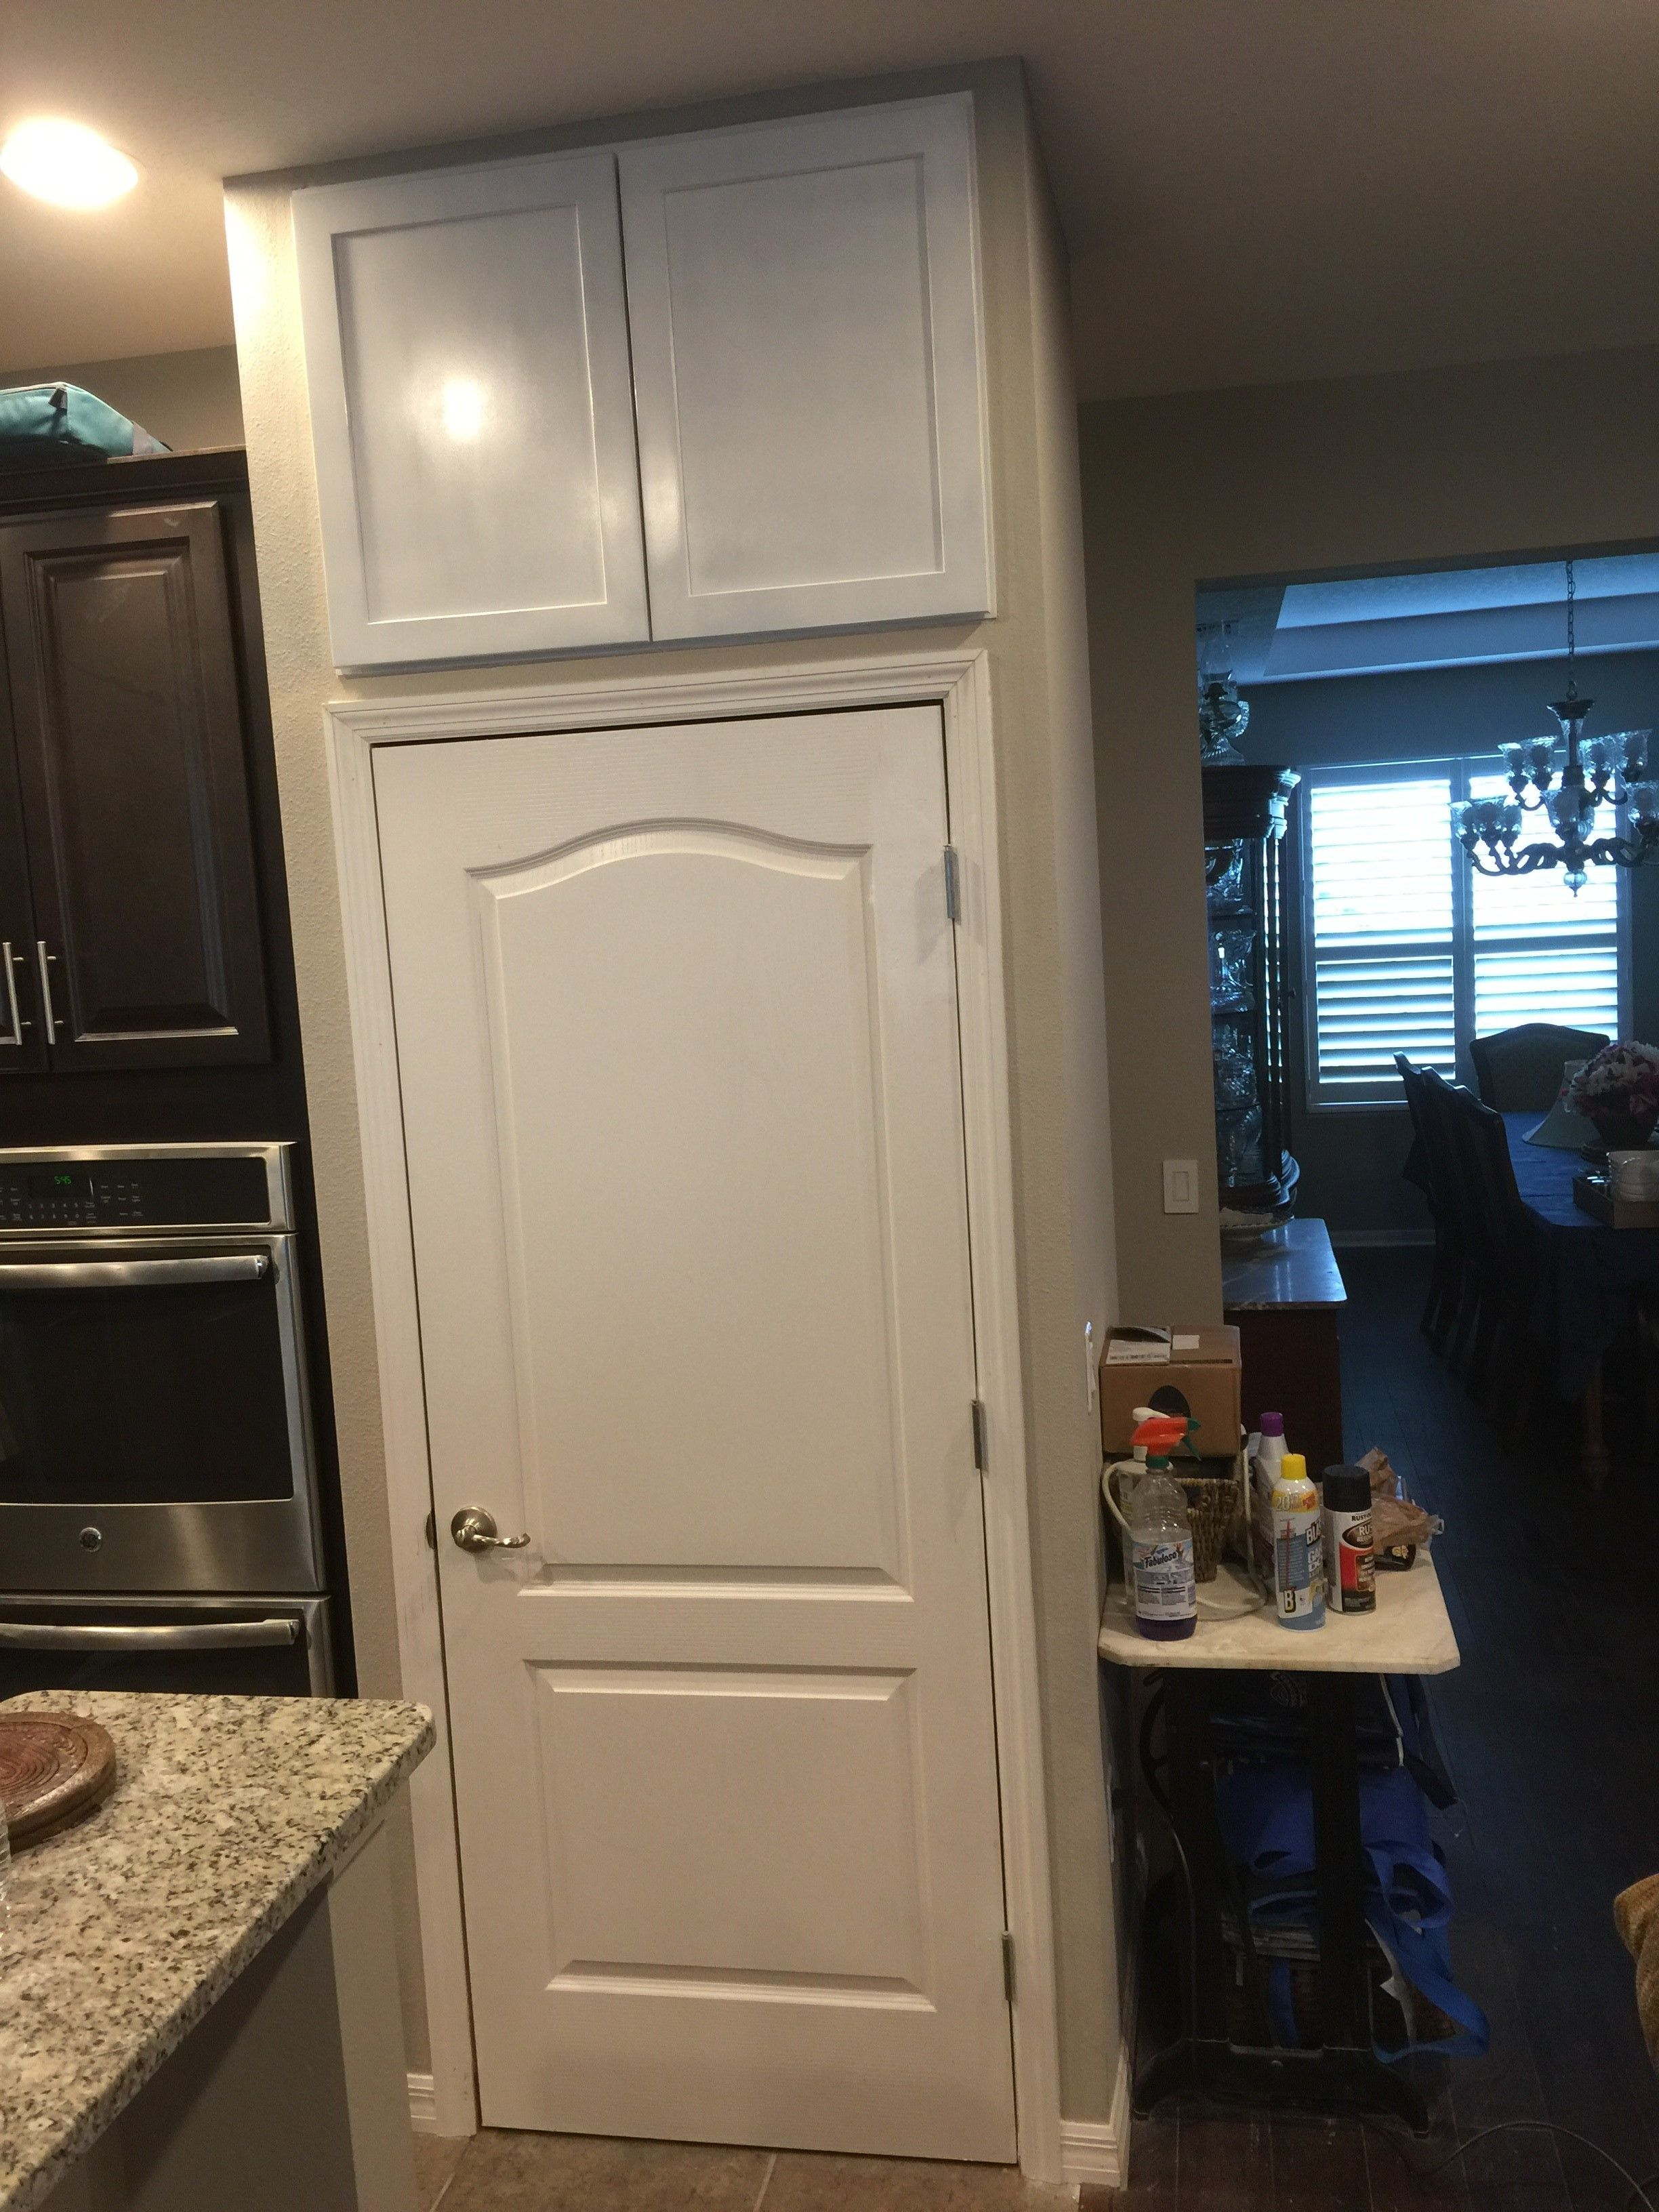 Storage Above Pantry Complete Home Decor Furniture Decor